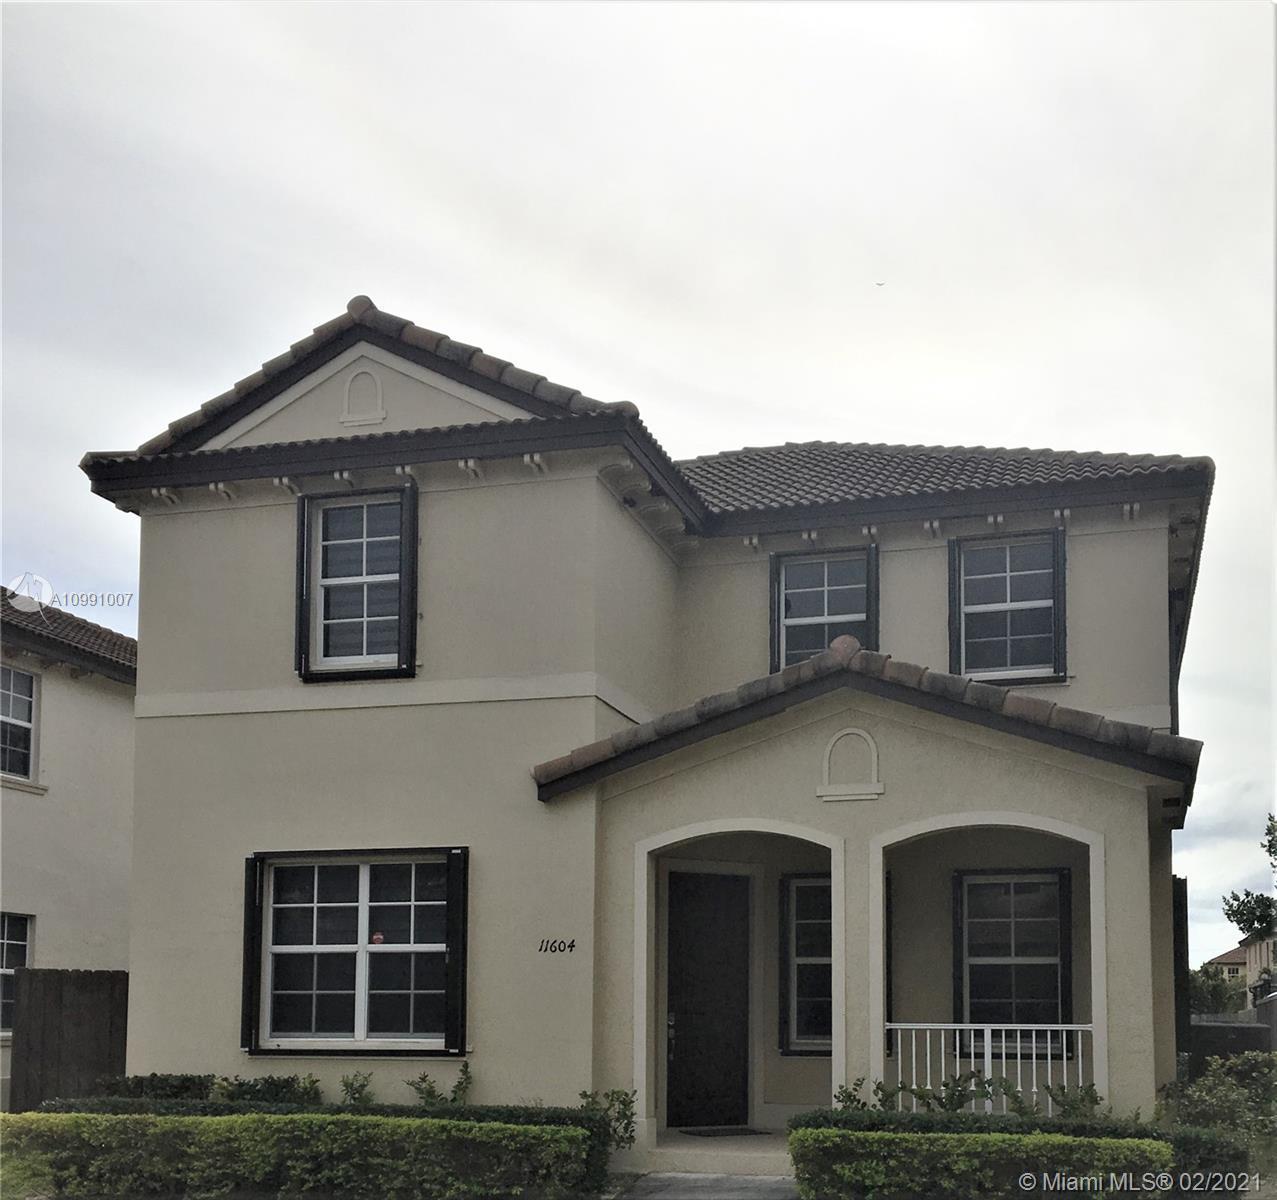 11604 SW 244th Ln Property Photo - Homestead, FL real estate listing